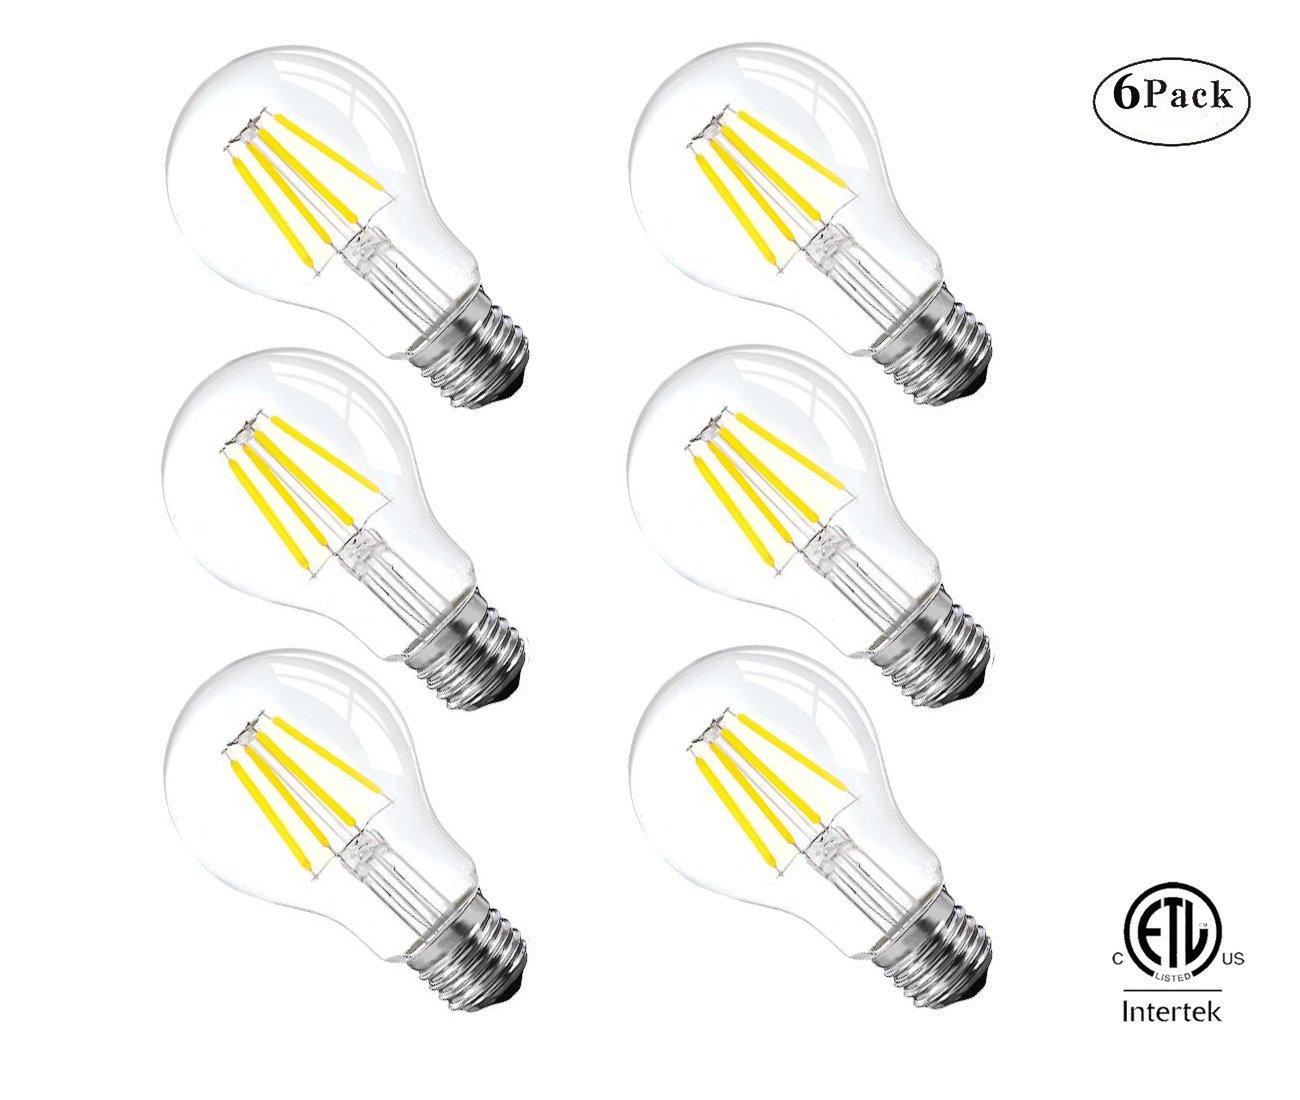 A60 4w led clear light bulb led edison bulb globe led light bulbs a60 4w led clear light bulb led edison bulb globe led light bulbs filament led bulbs aloadofball Gallery